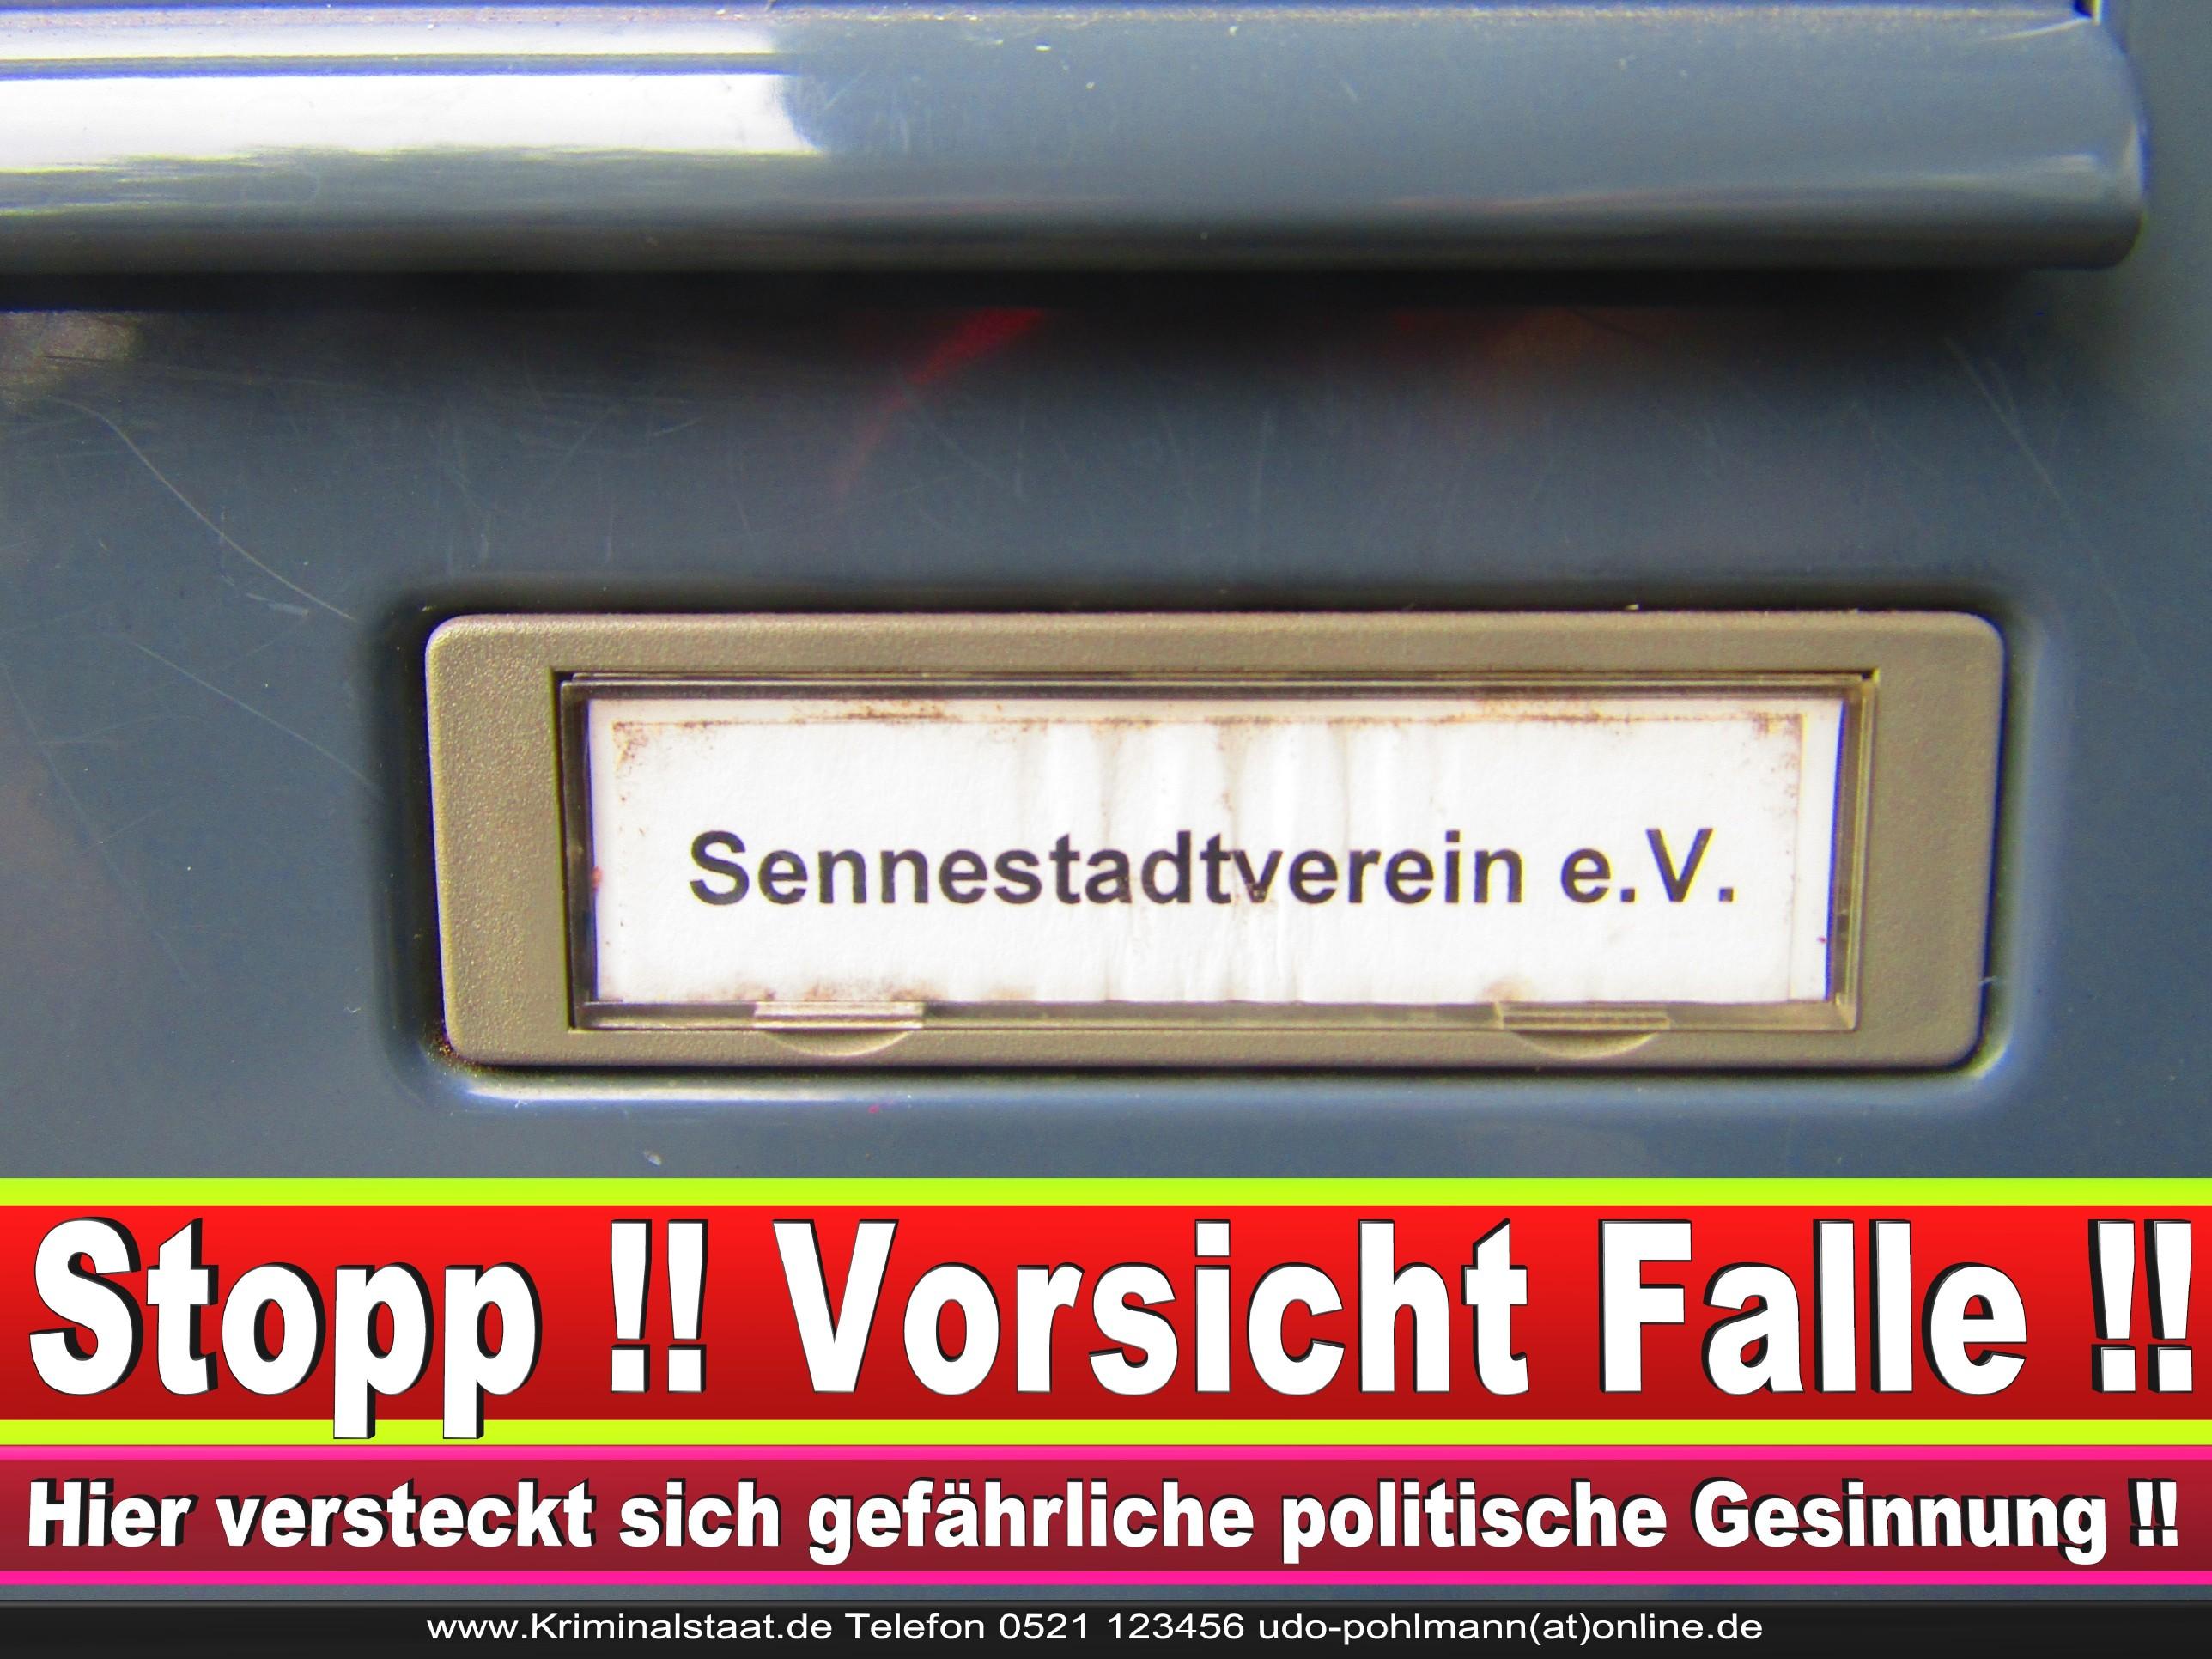 SENNESTADTVEREIN CDU BIELEFELD 2 LANDTAGSWAHL BUNDESTAGSWAHL BÜRGERMEISTERWAHL